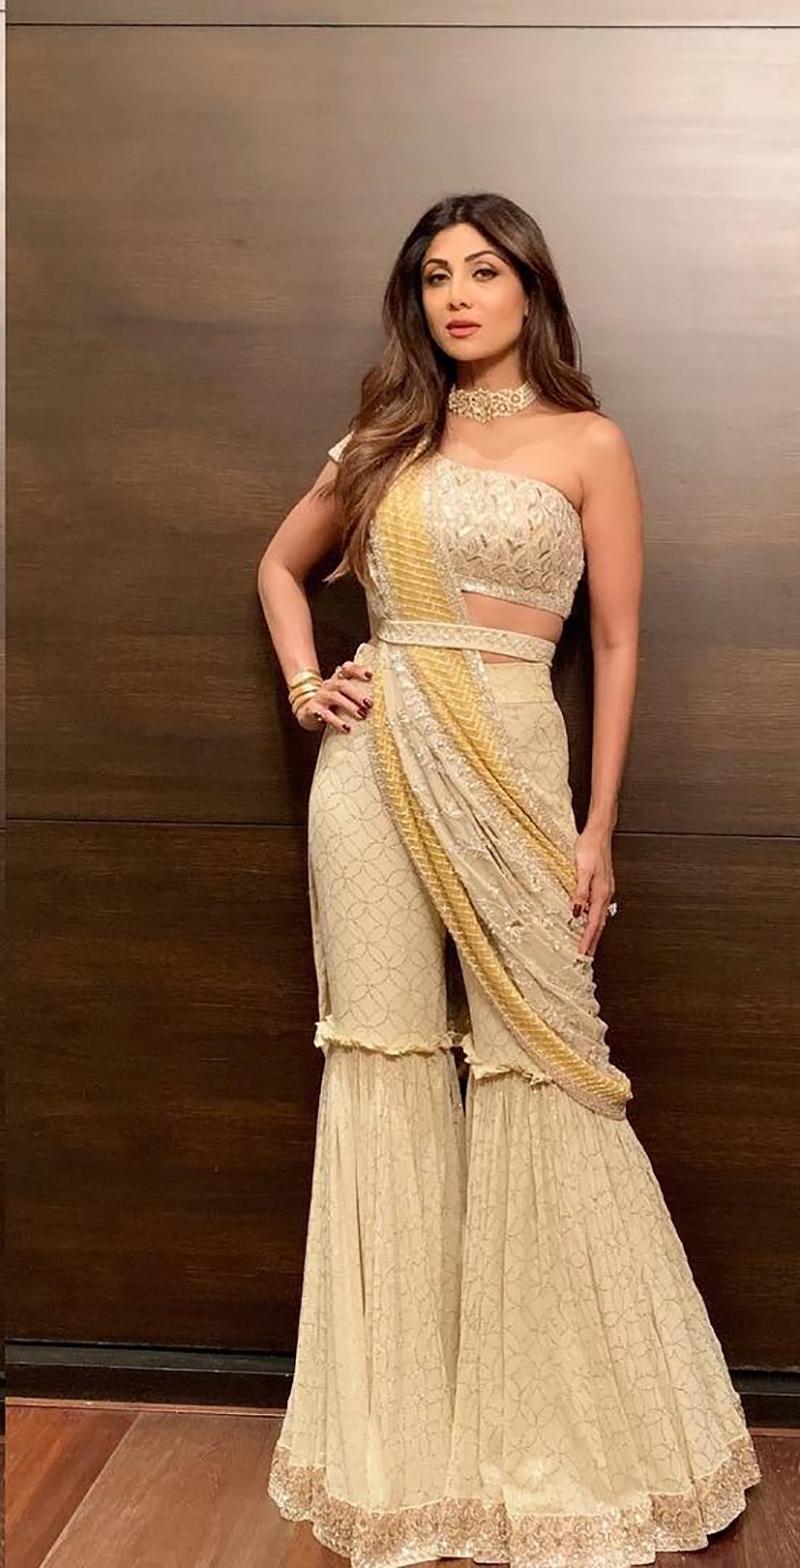 6. Shilpa Shetty